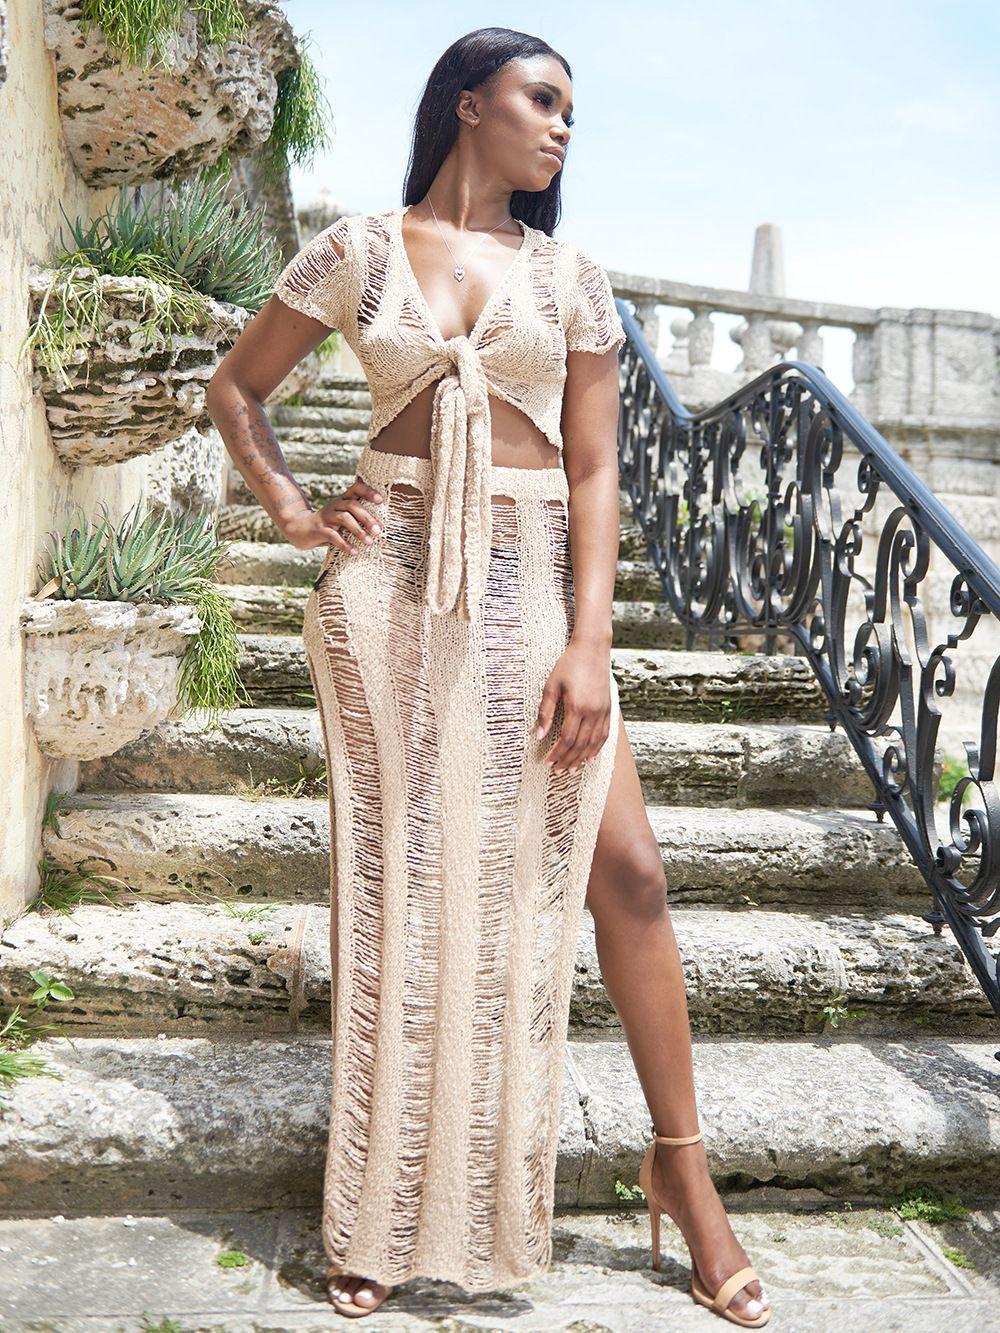 Envío gratis Sexy Wrap Bathing Swimwear Split Skirt Summer Long knitted Dress nuevas mujeres See Through Sarong Swim Cover Up Beach Dress